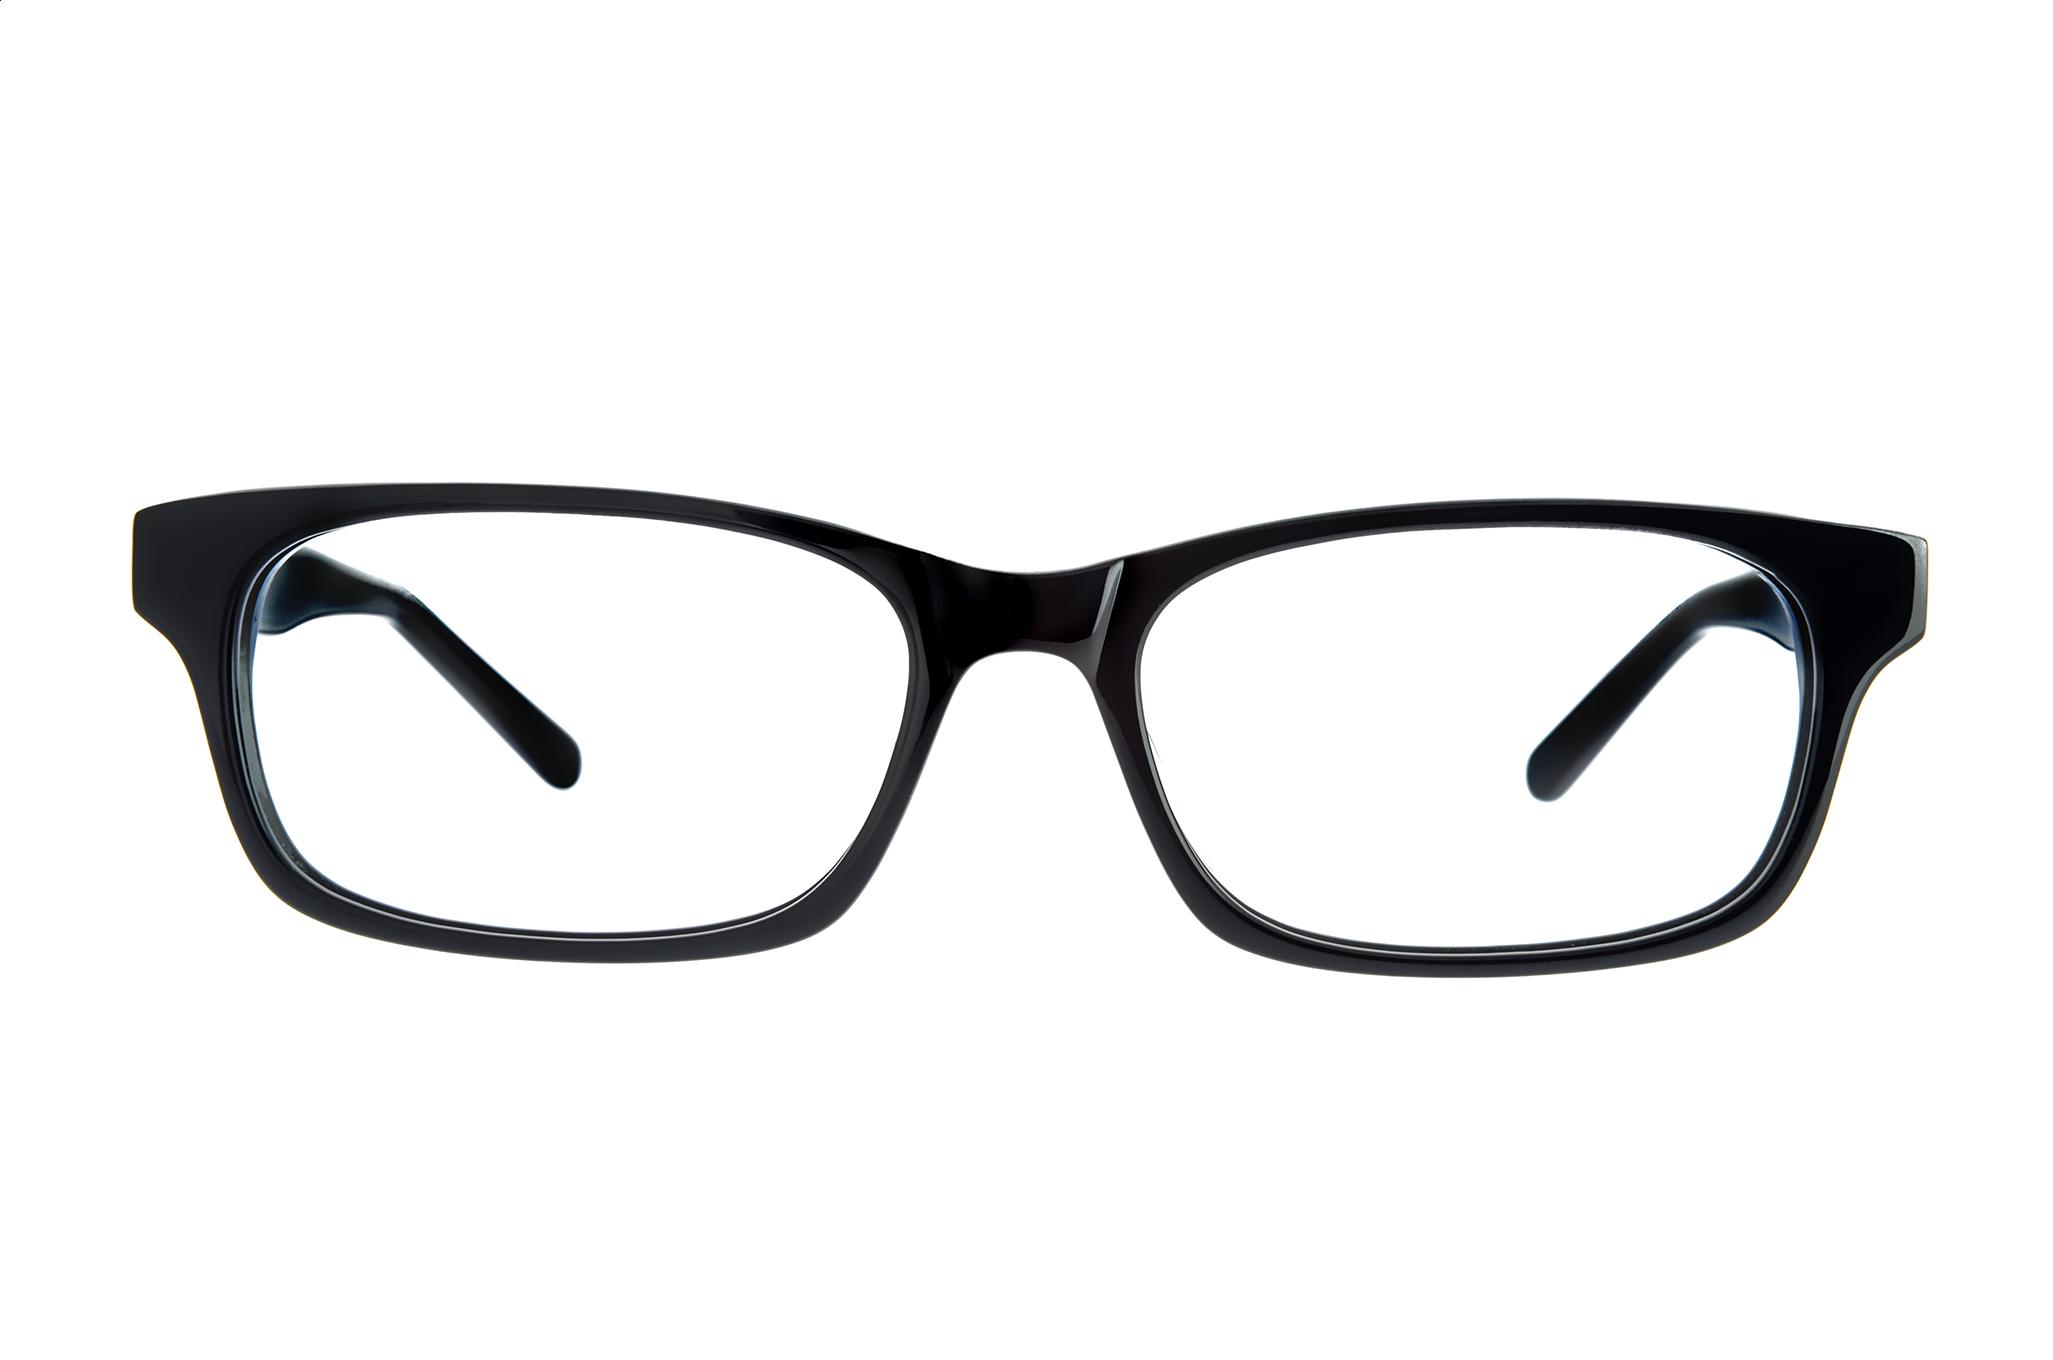 Glass optical frames illustrations. Hands clipart lense